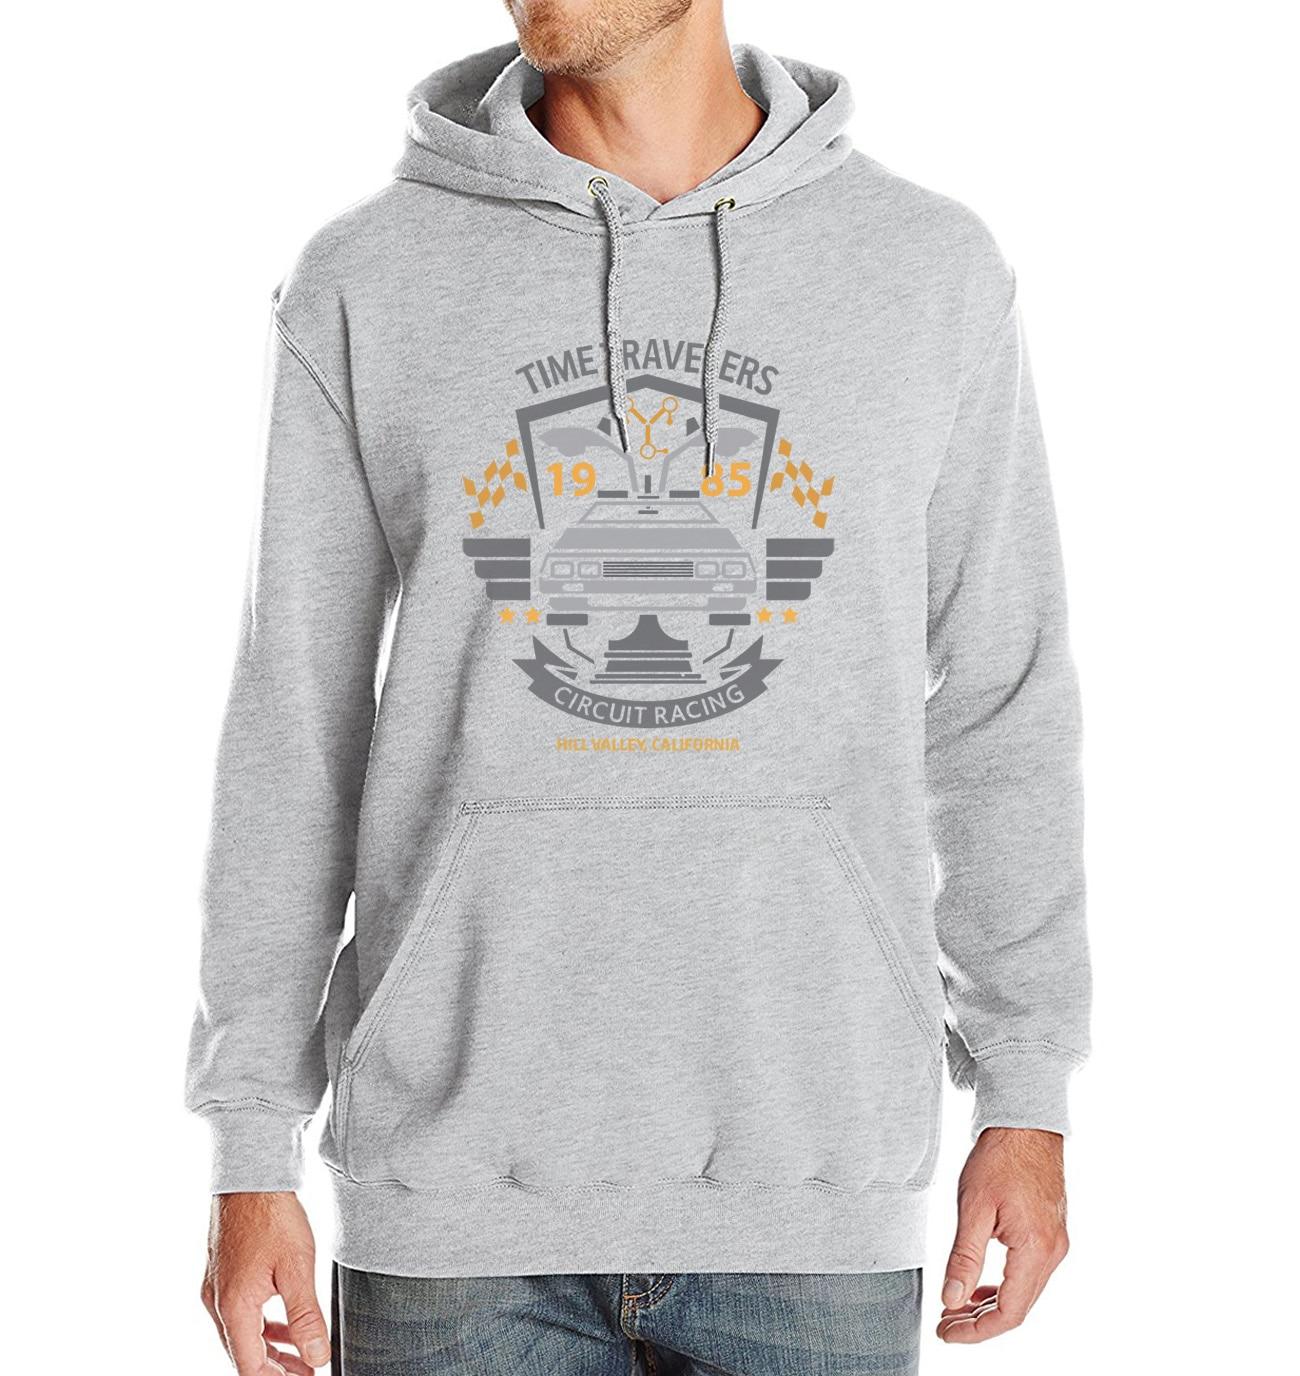 BACK TO FUTURE Sweatshirt Men 2018 Autumn Winter Fleece Men's Hoodies Fashion Streetwear Brand Clothing Hooded Hoodie Tracksuit